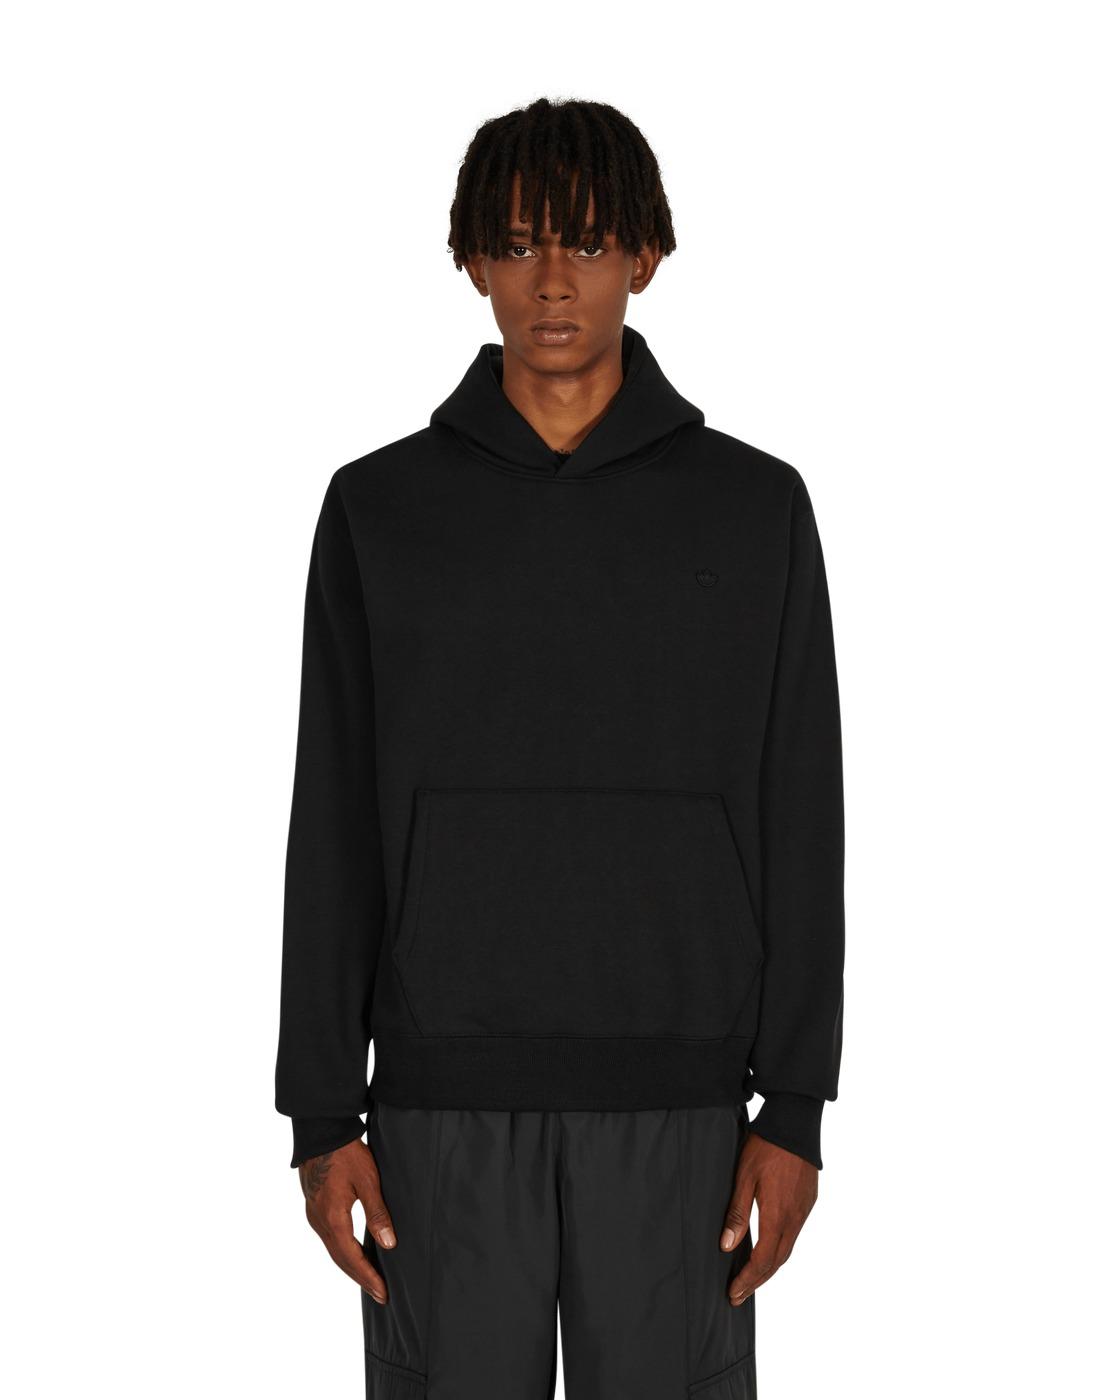 Photo: Adidas Originals Adicolor Trefoil Hooded Sweatshirt Black